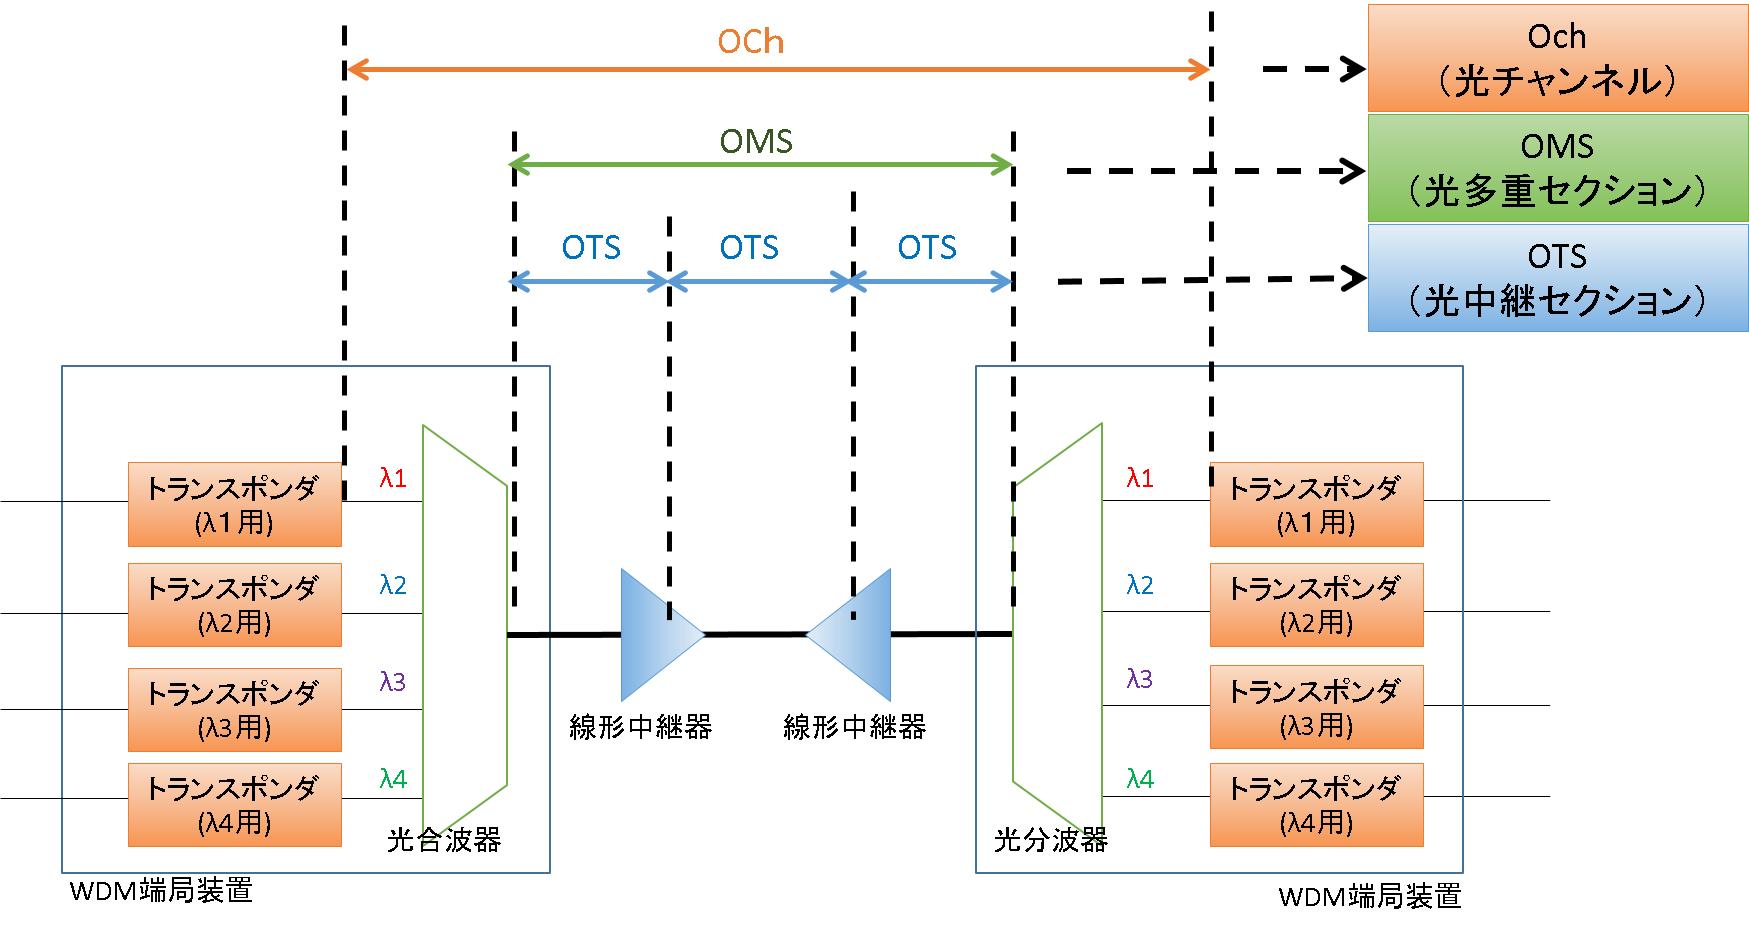 OTN_range.png